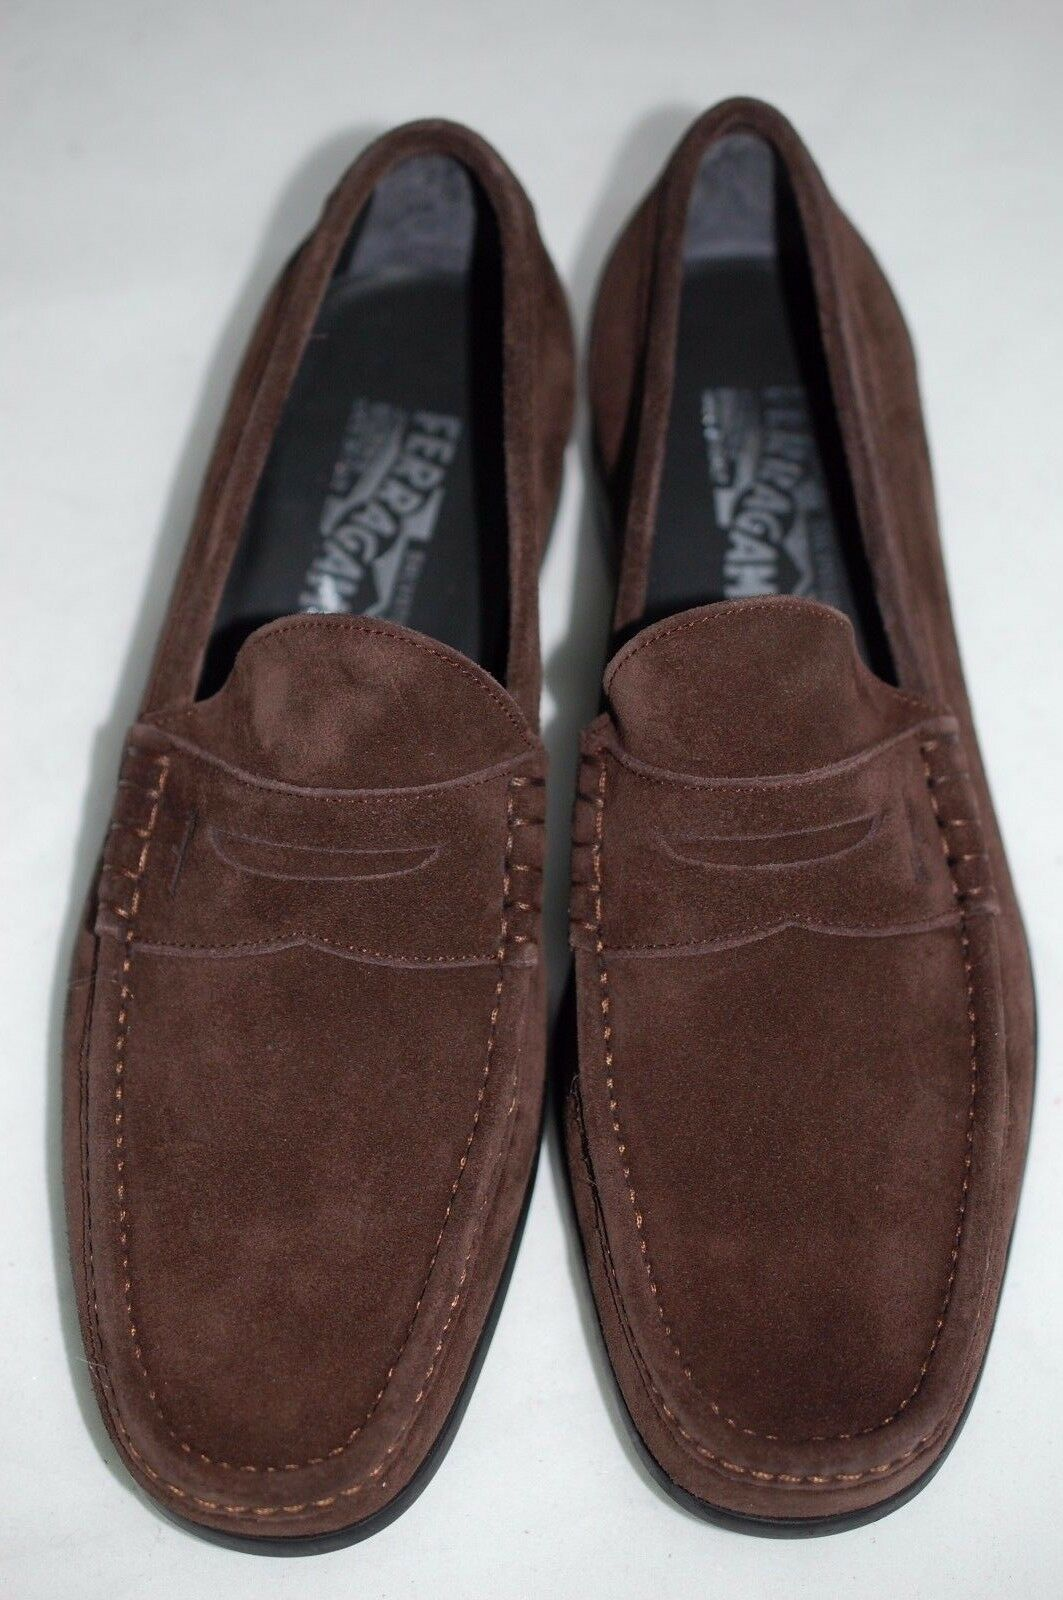 SALVATORE FERRAGAMO Marco Dark Brown Suede Penny Loafer Men Wide shoes 7 EE